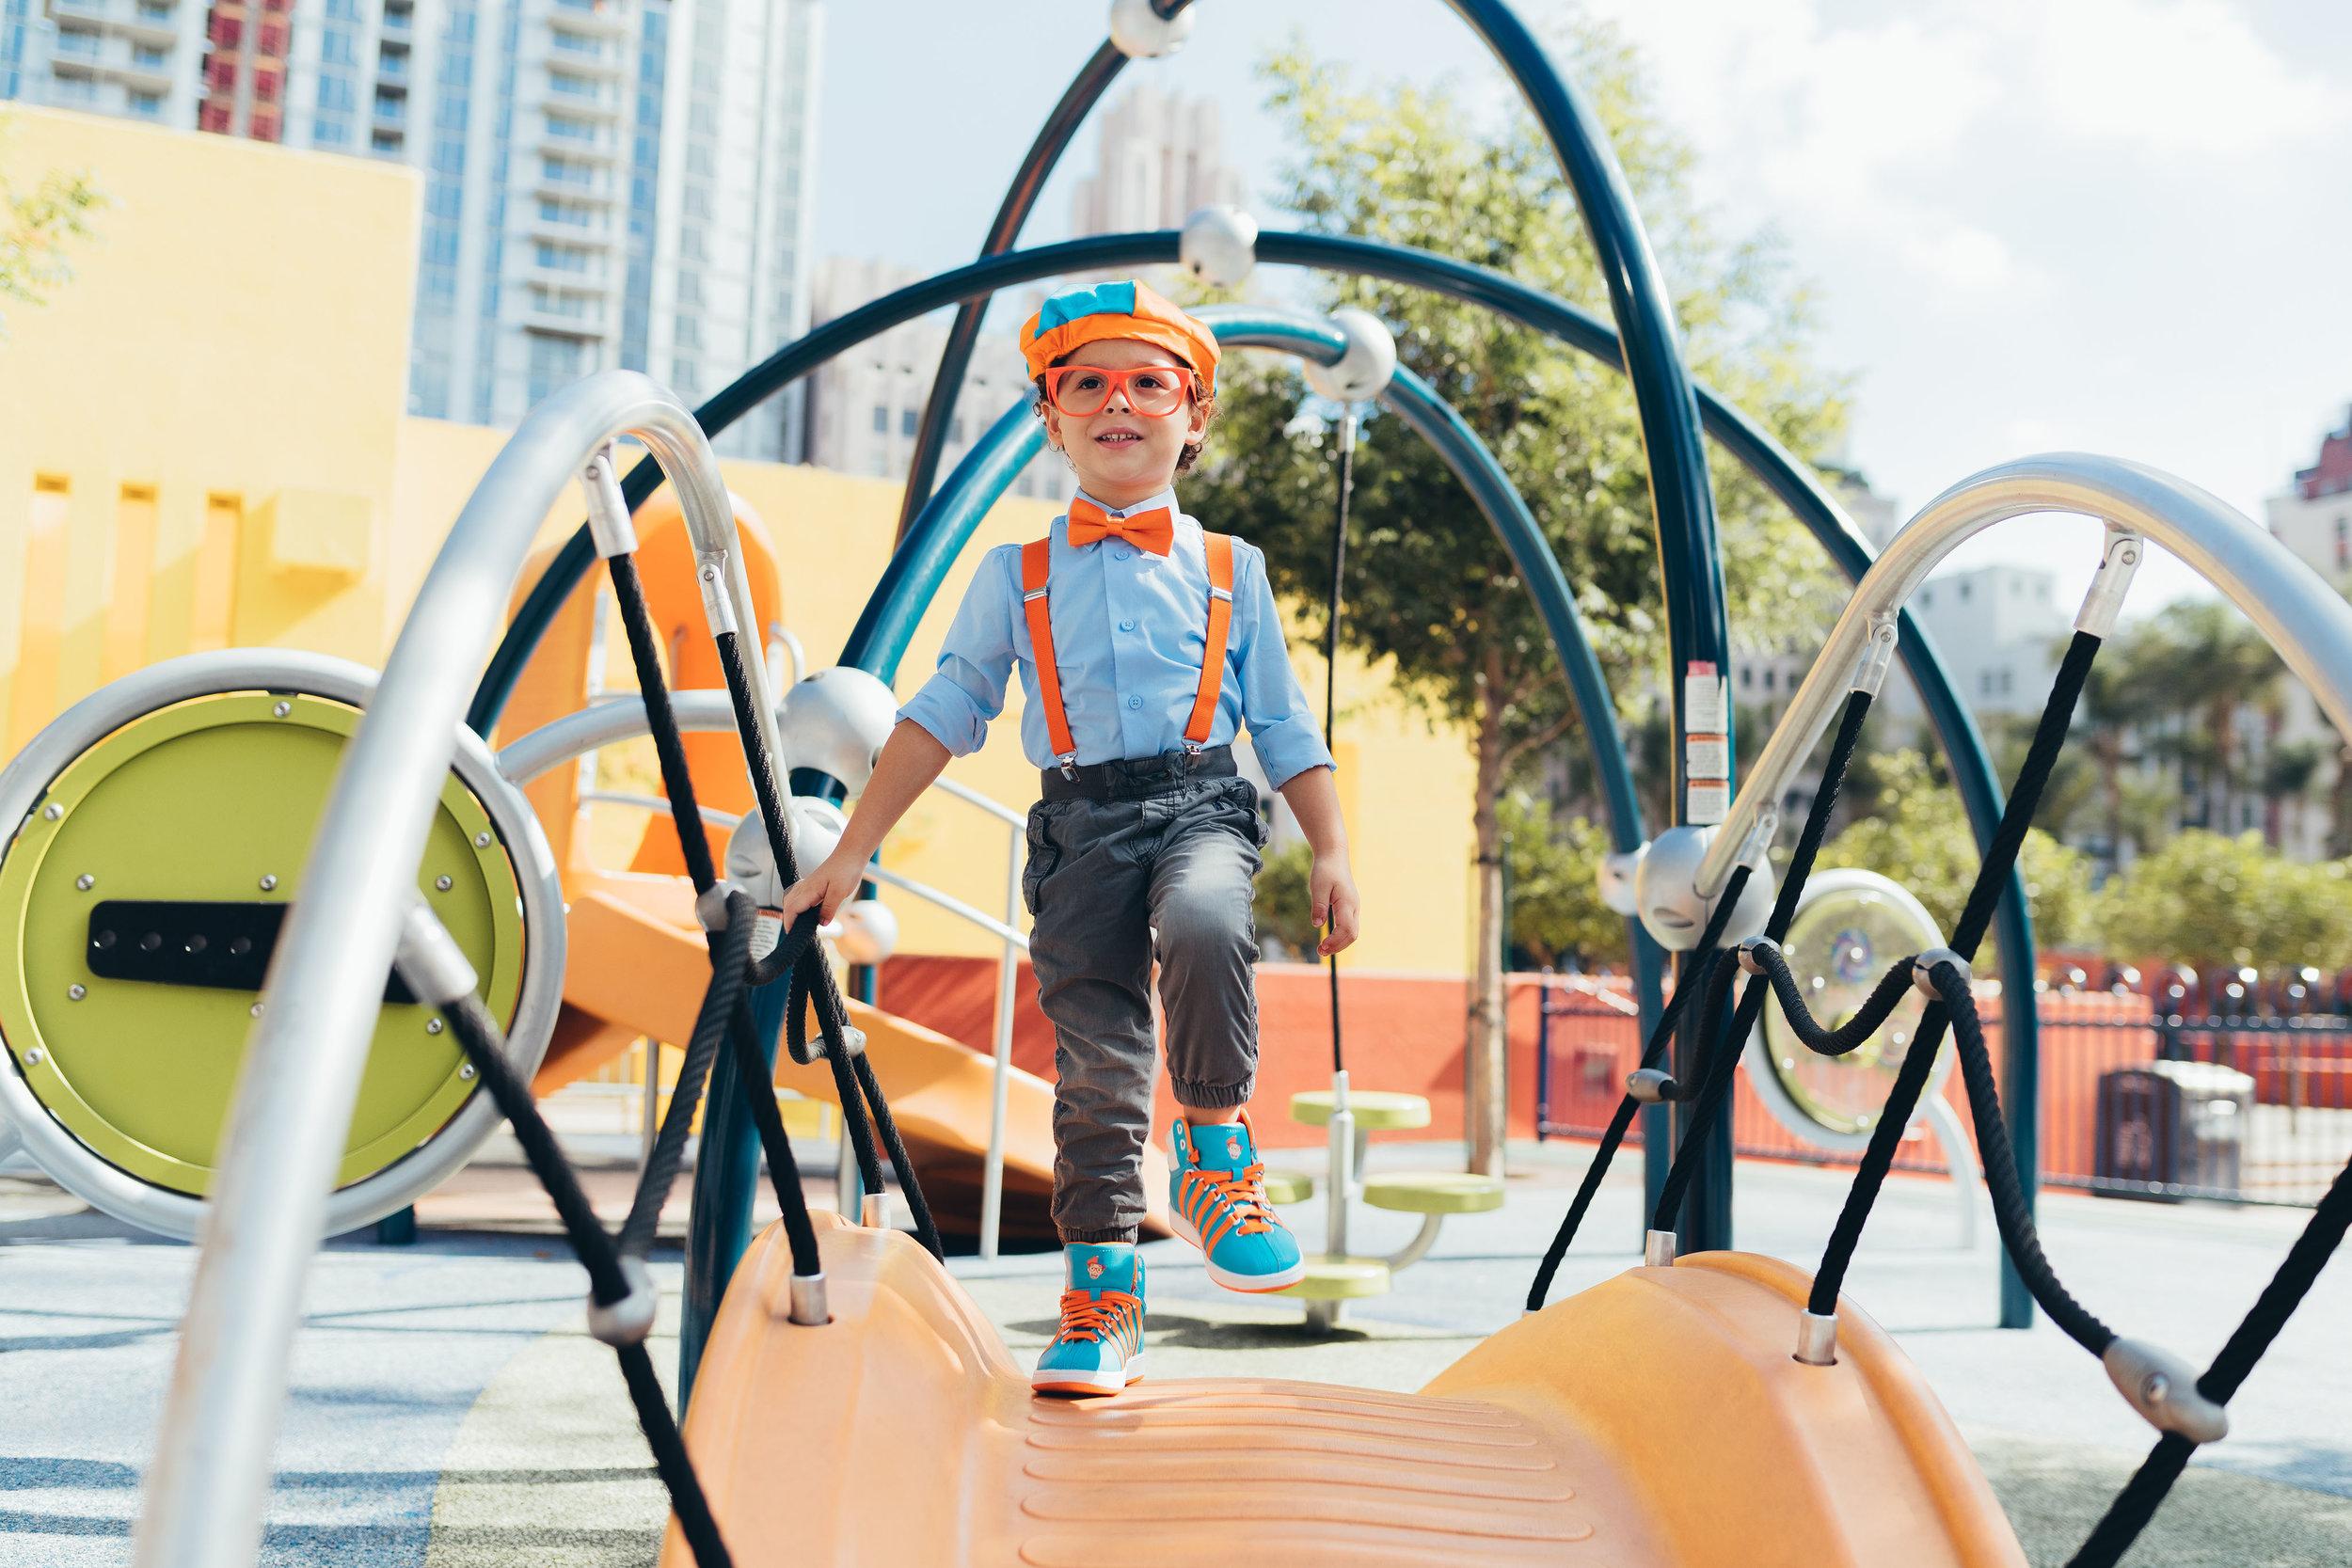 kswiss-blippi-lifestyle-outdoors-kids-web-3.jpg